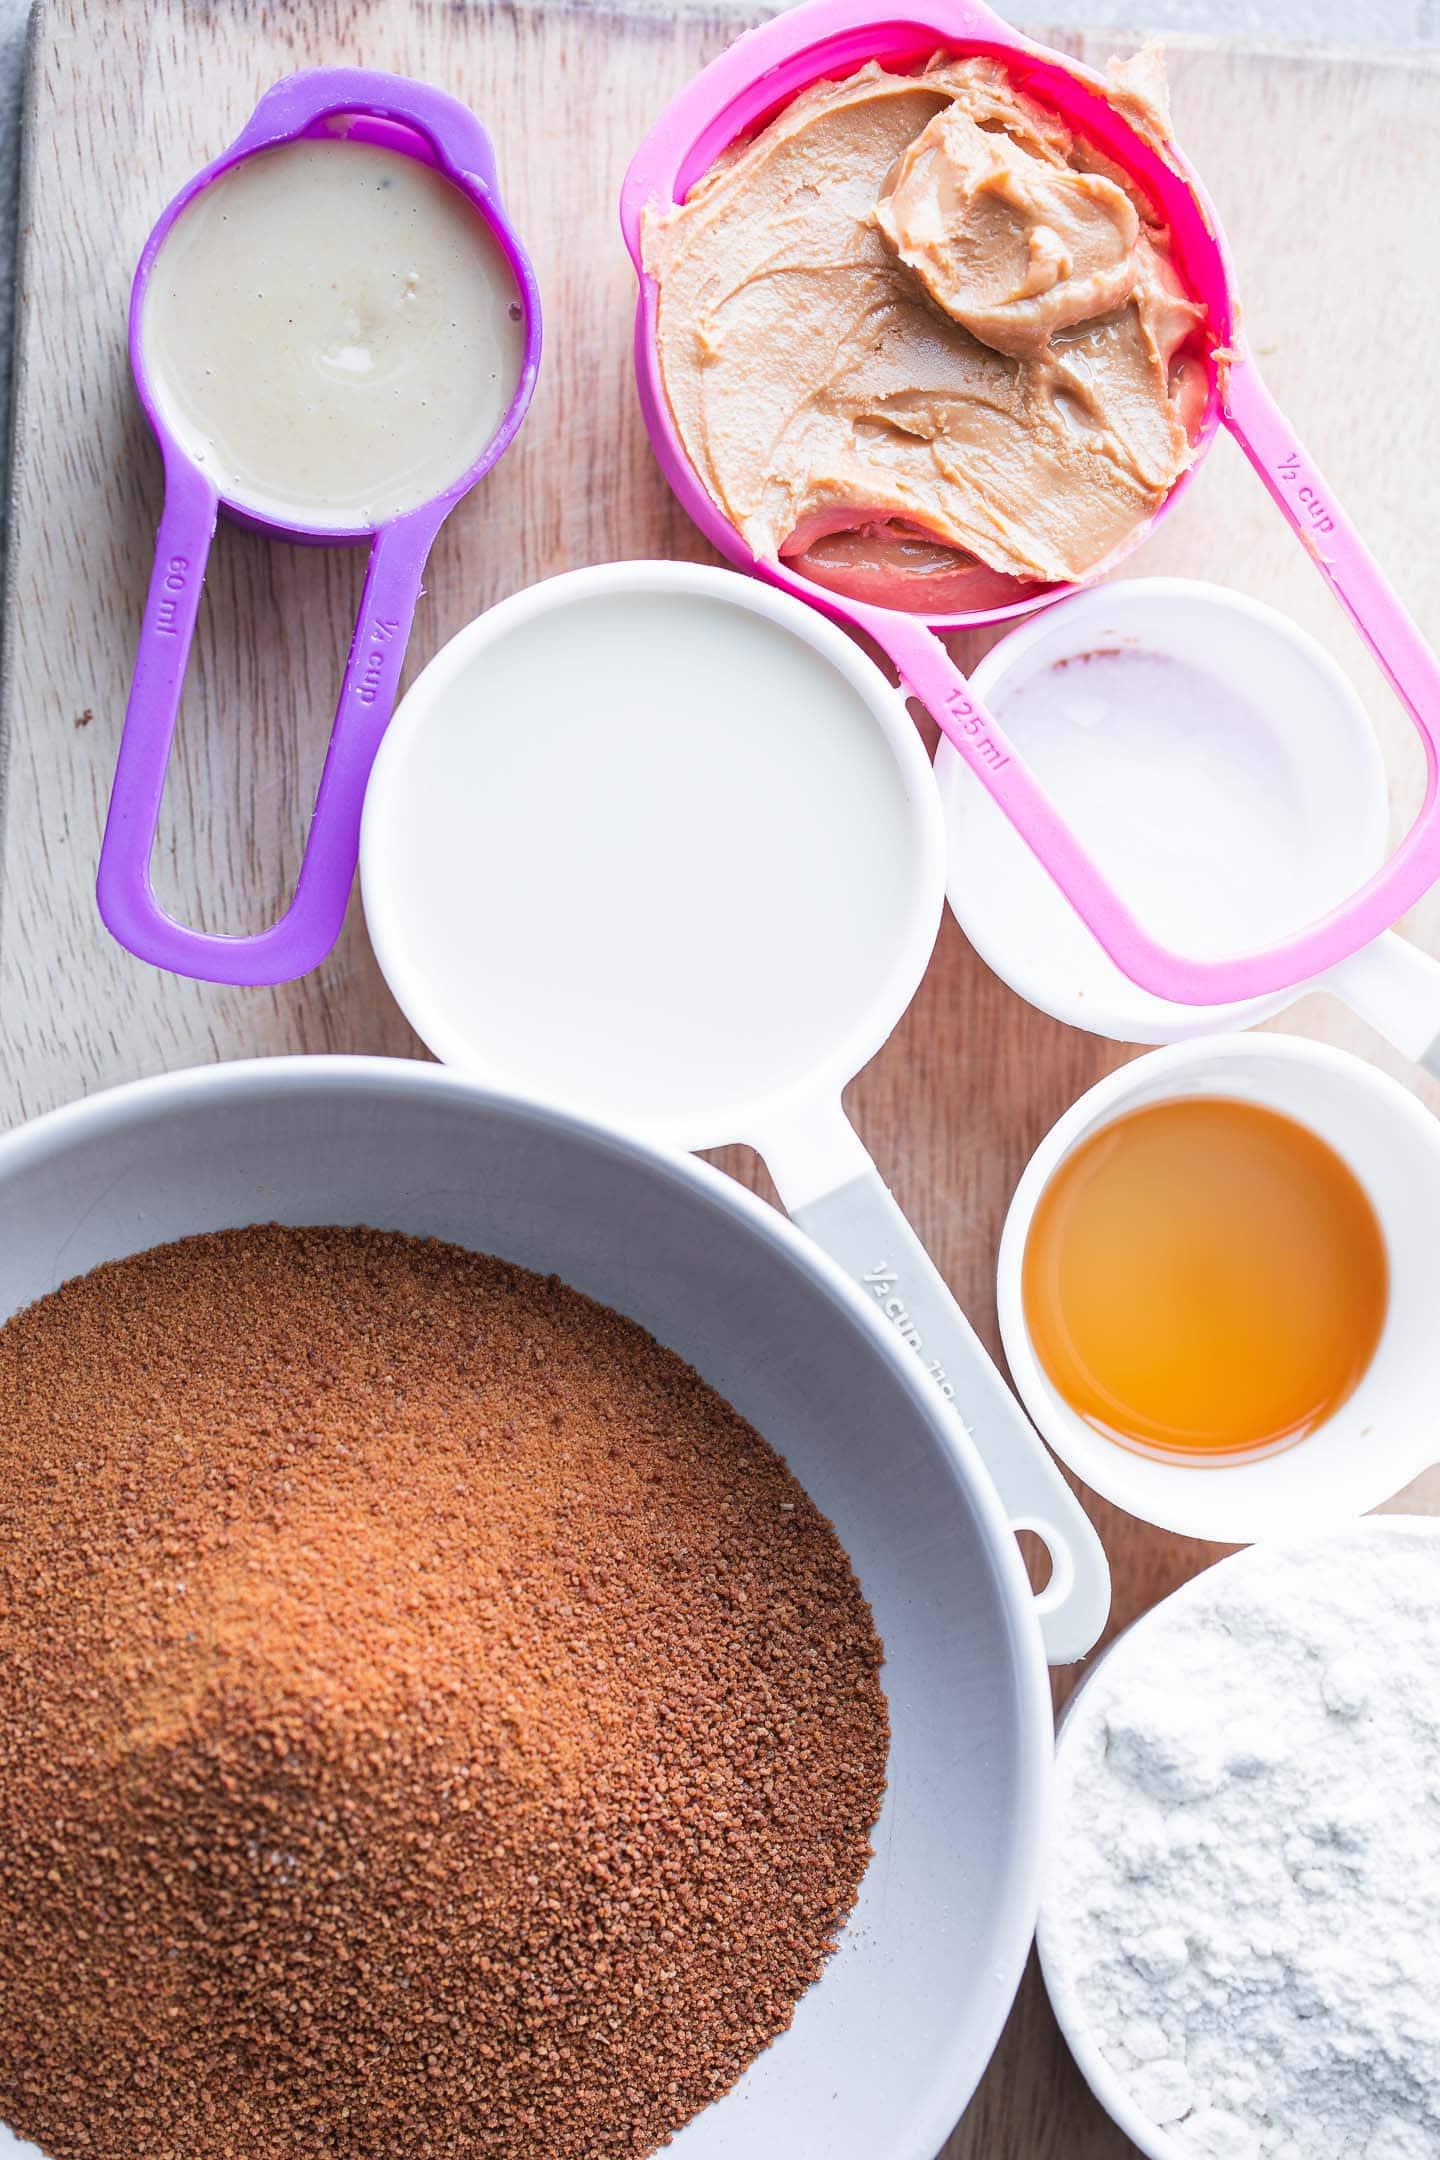 Ingredients for peanut butter tahini cookies